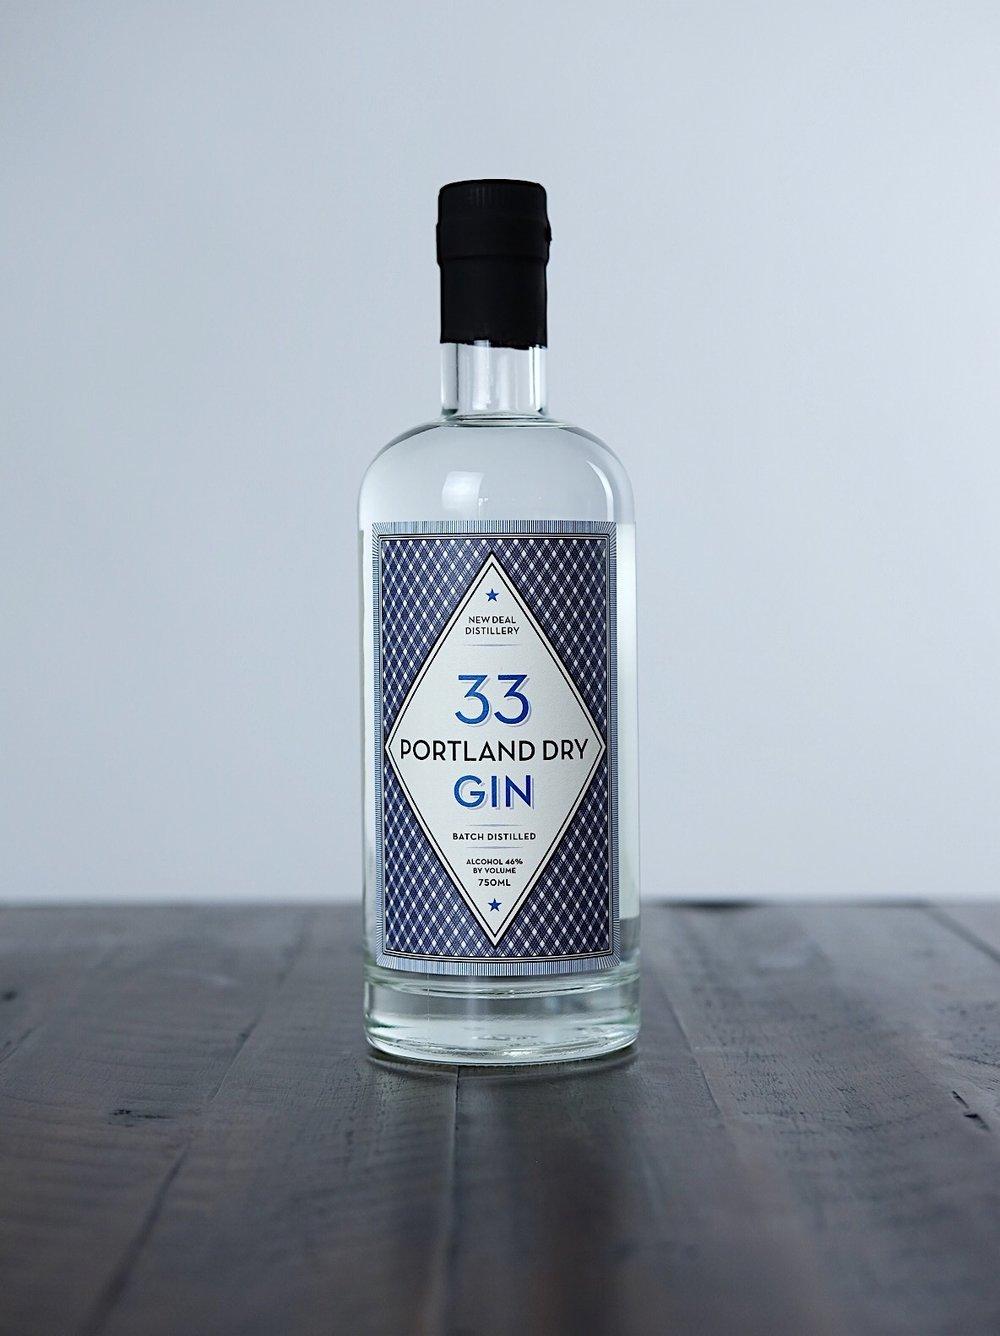 Portland Dry Gin 33 - AGE: unagedCOST: $25ABV: 46DEFINING FLAVORS: Juniper Berries & Pine